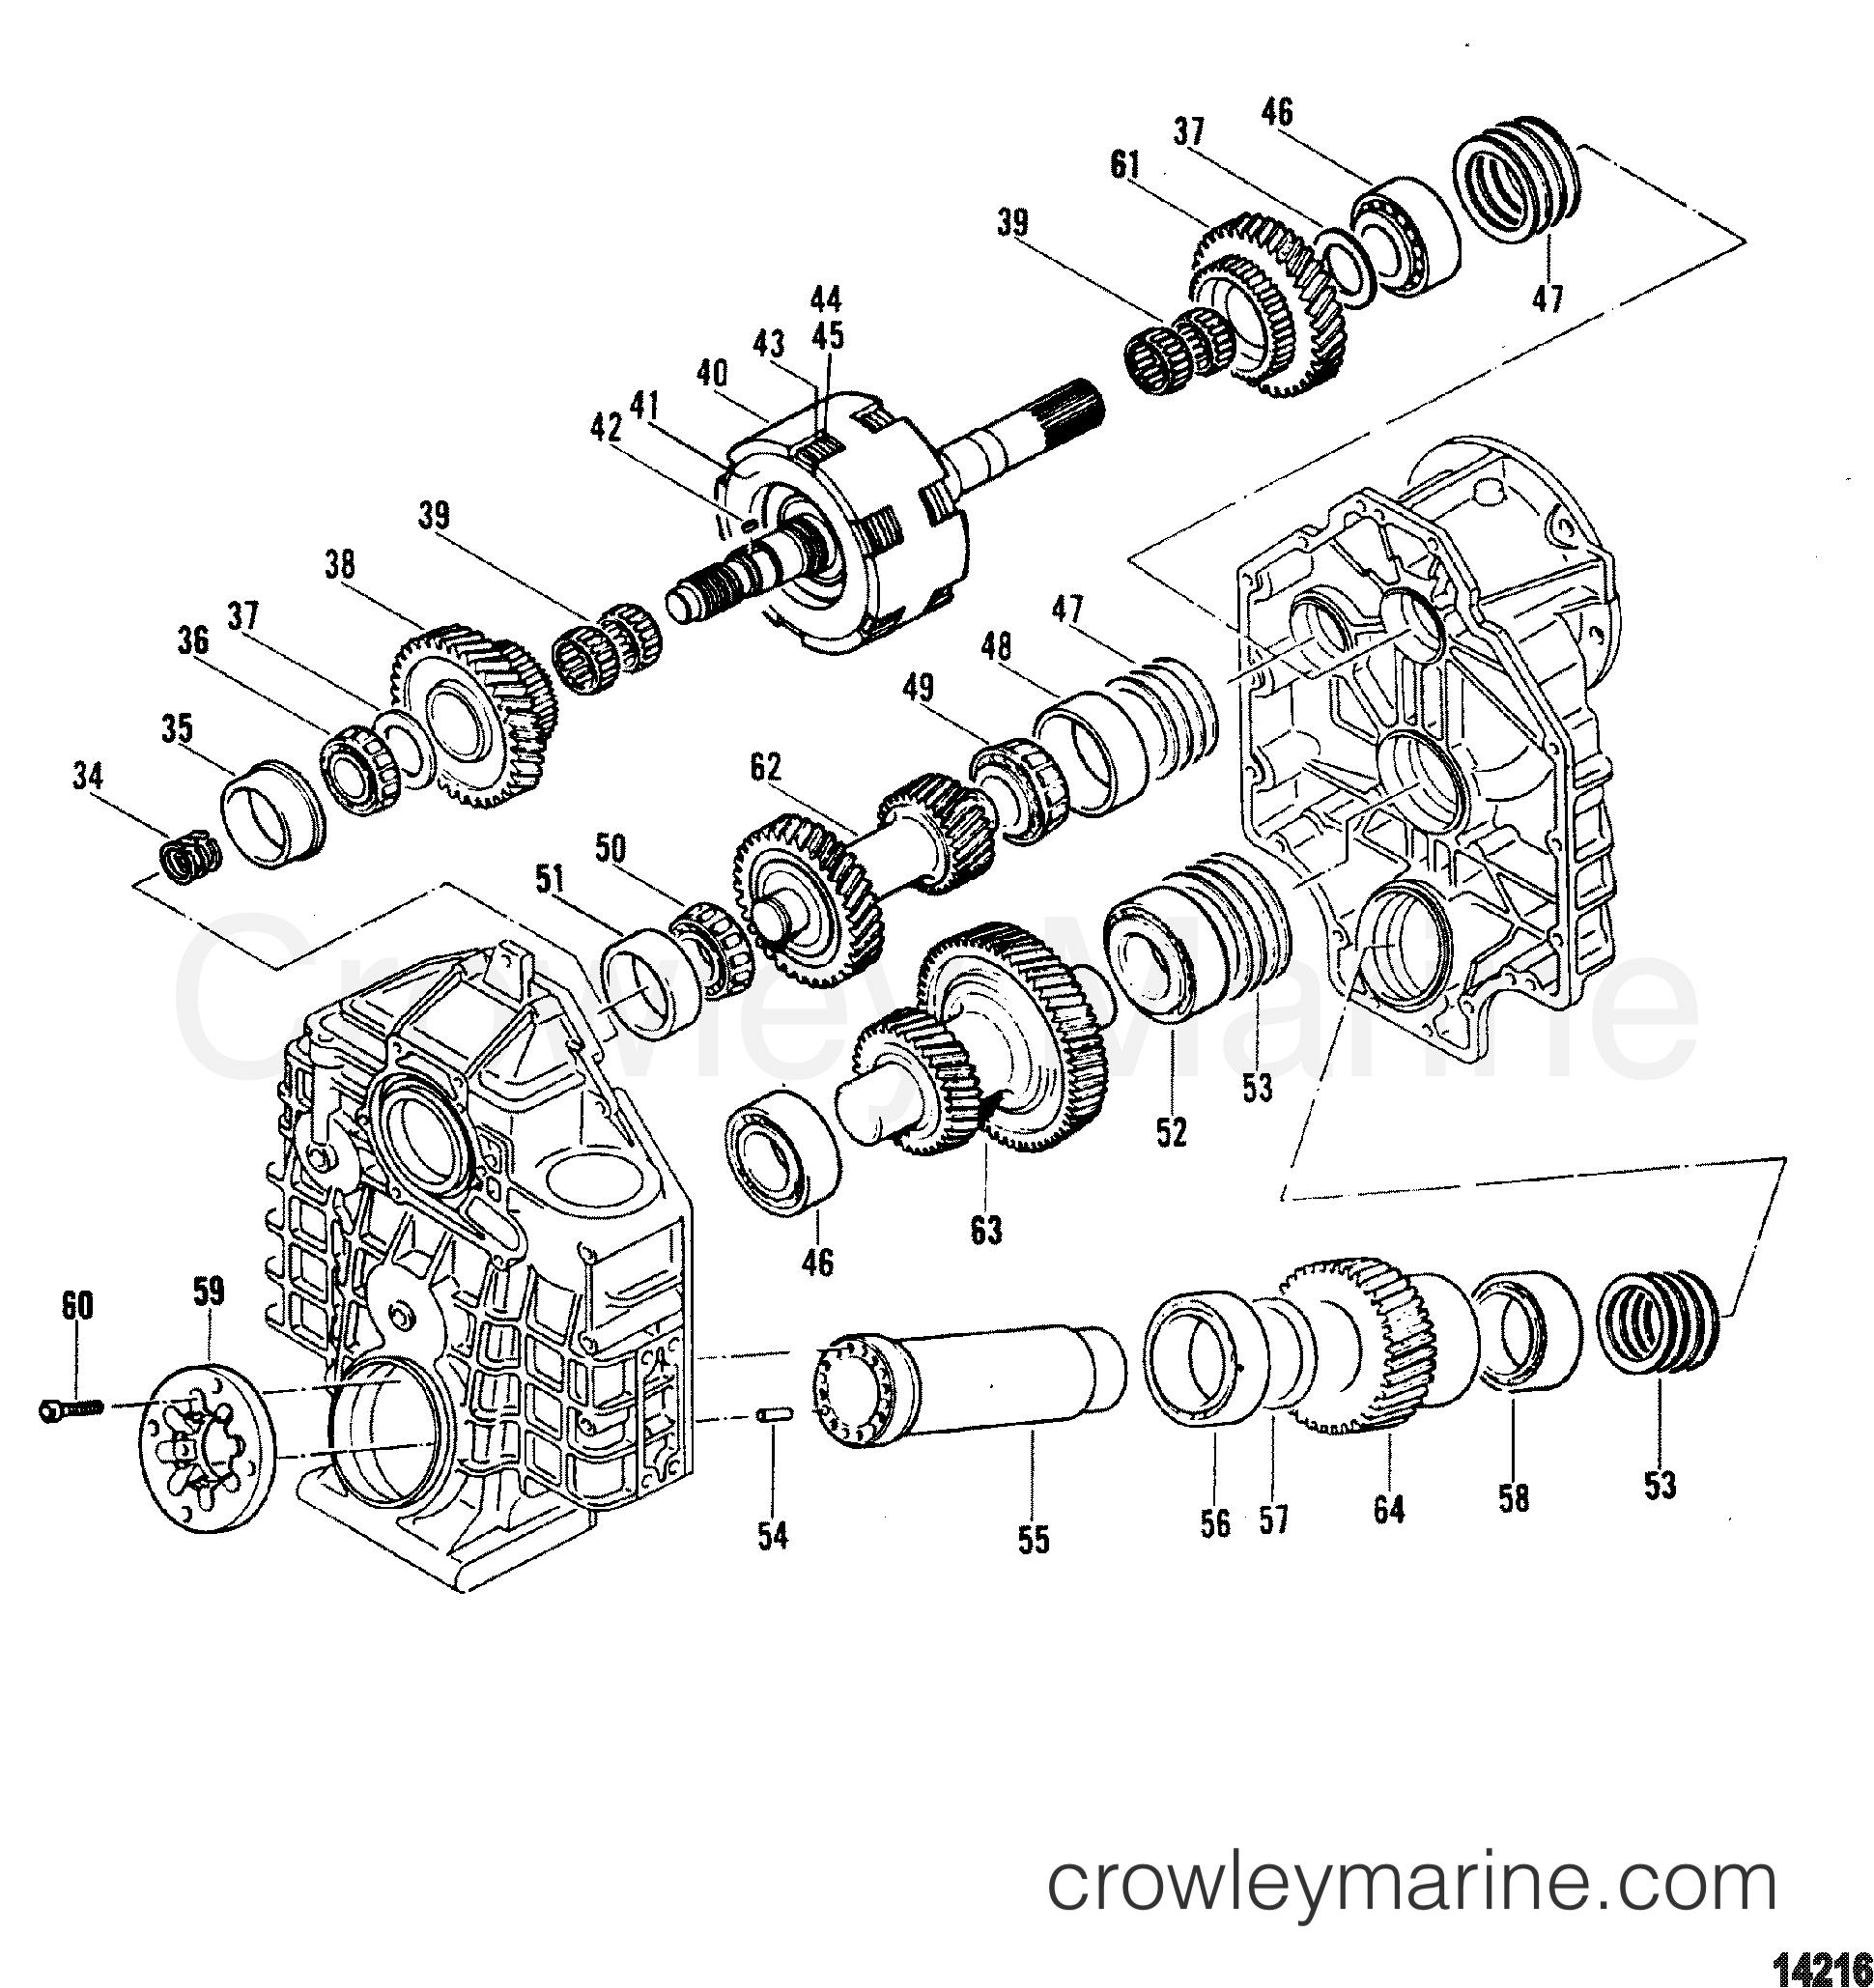 1995 Mercury Inboard Engine 7.4L [CARB] - 37435C6HS TRANSMISSION (V-DRIVE)(HURTH) (2 OF 2) section